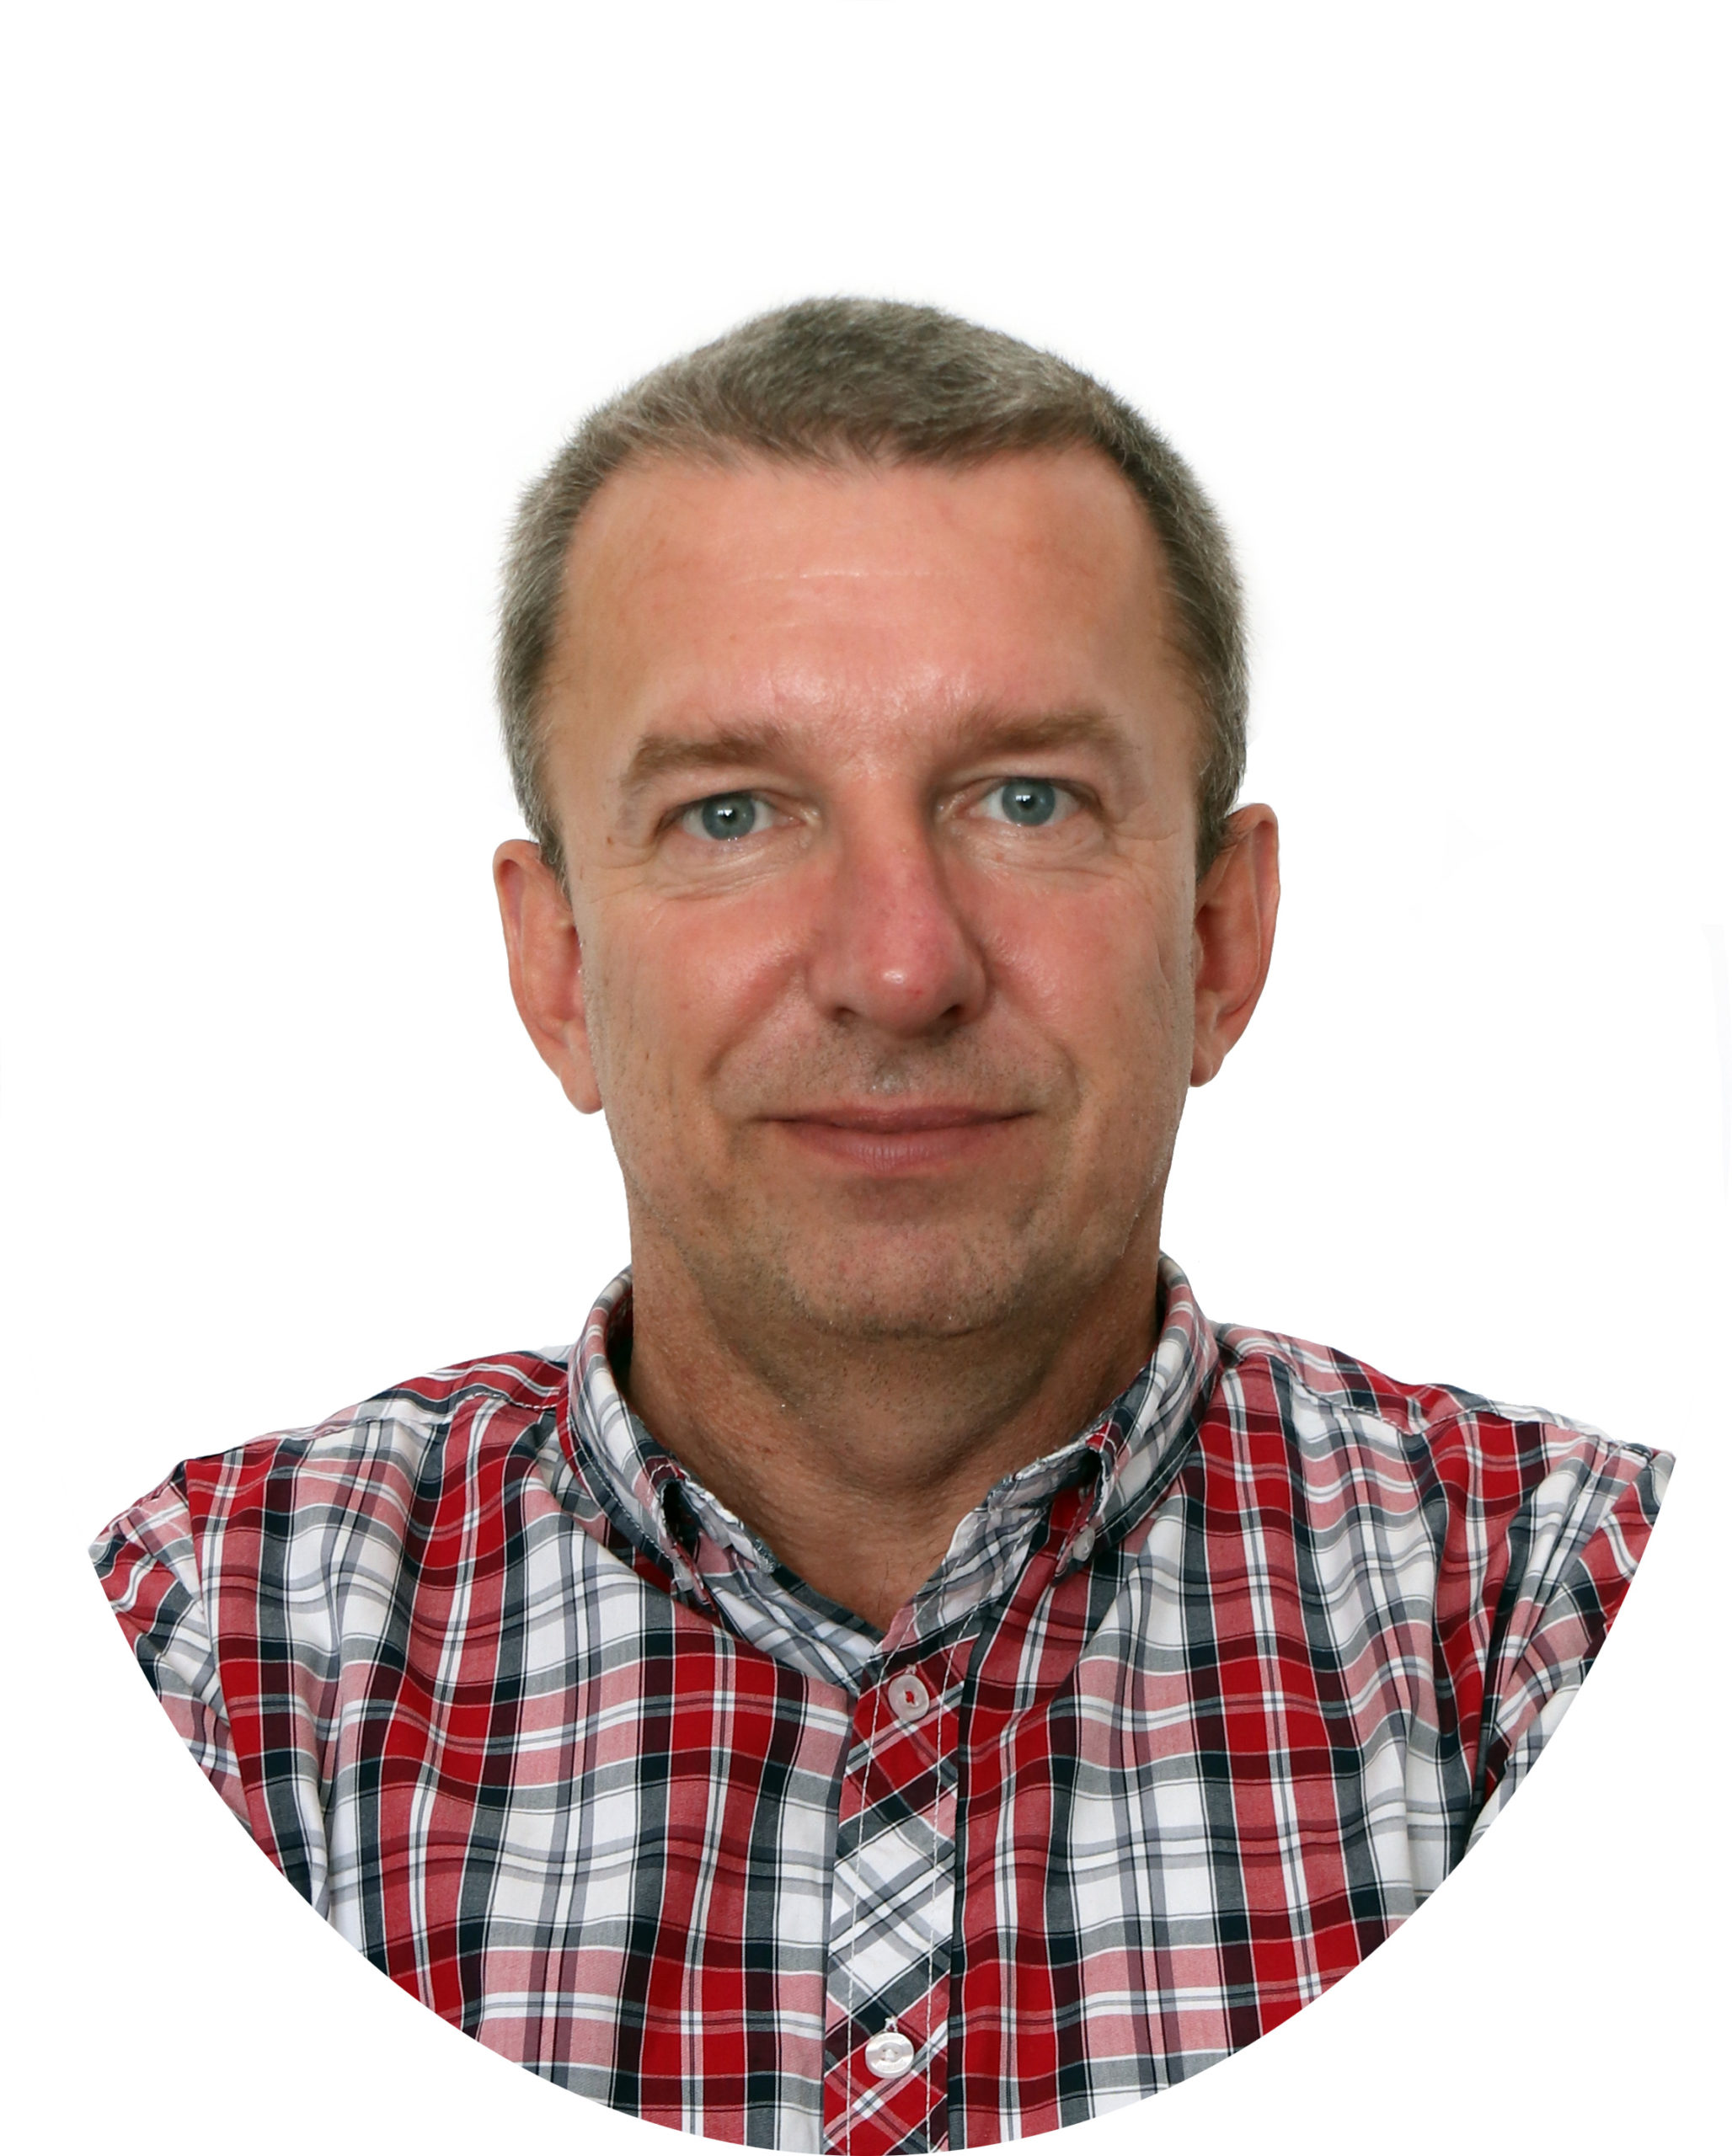 Peter Réves